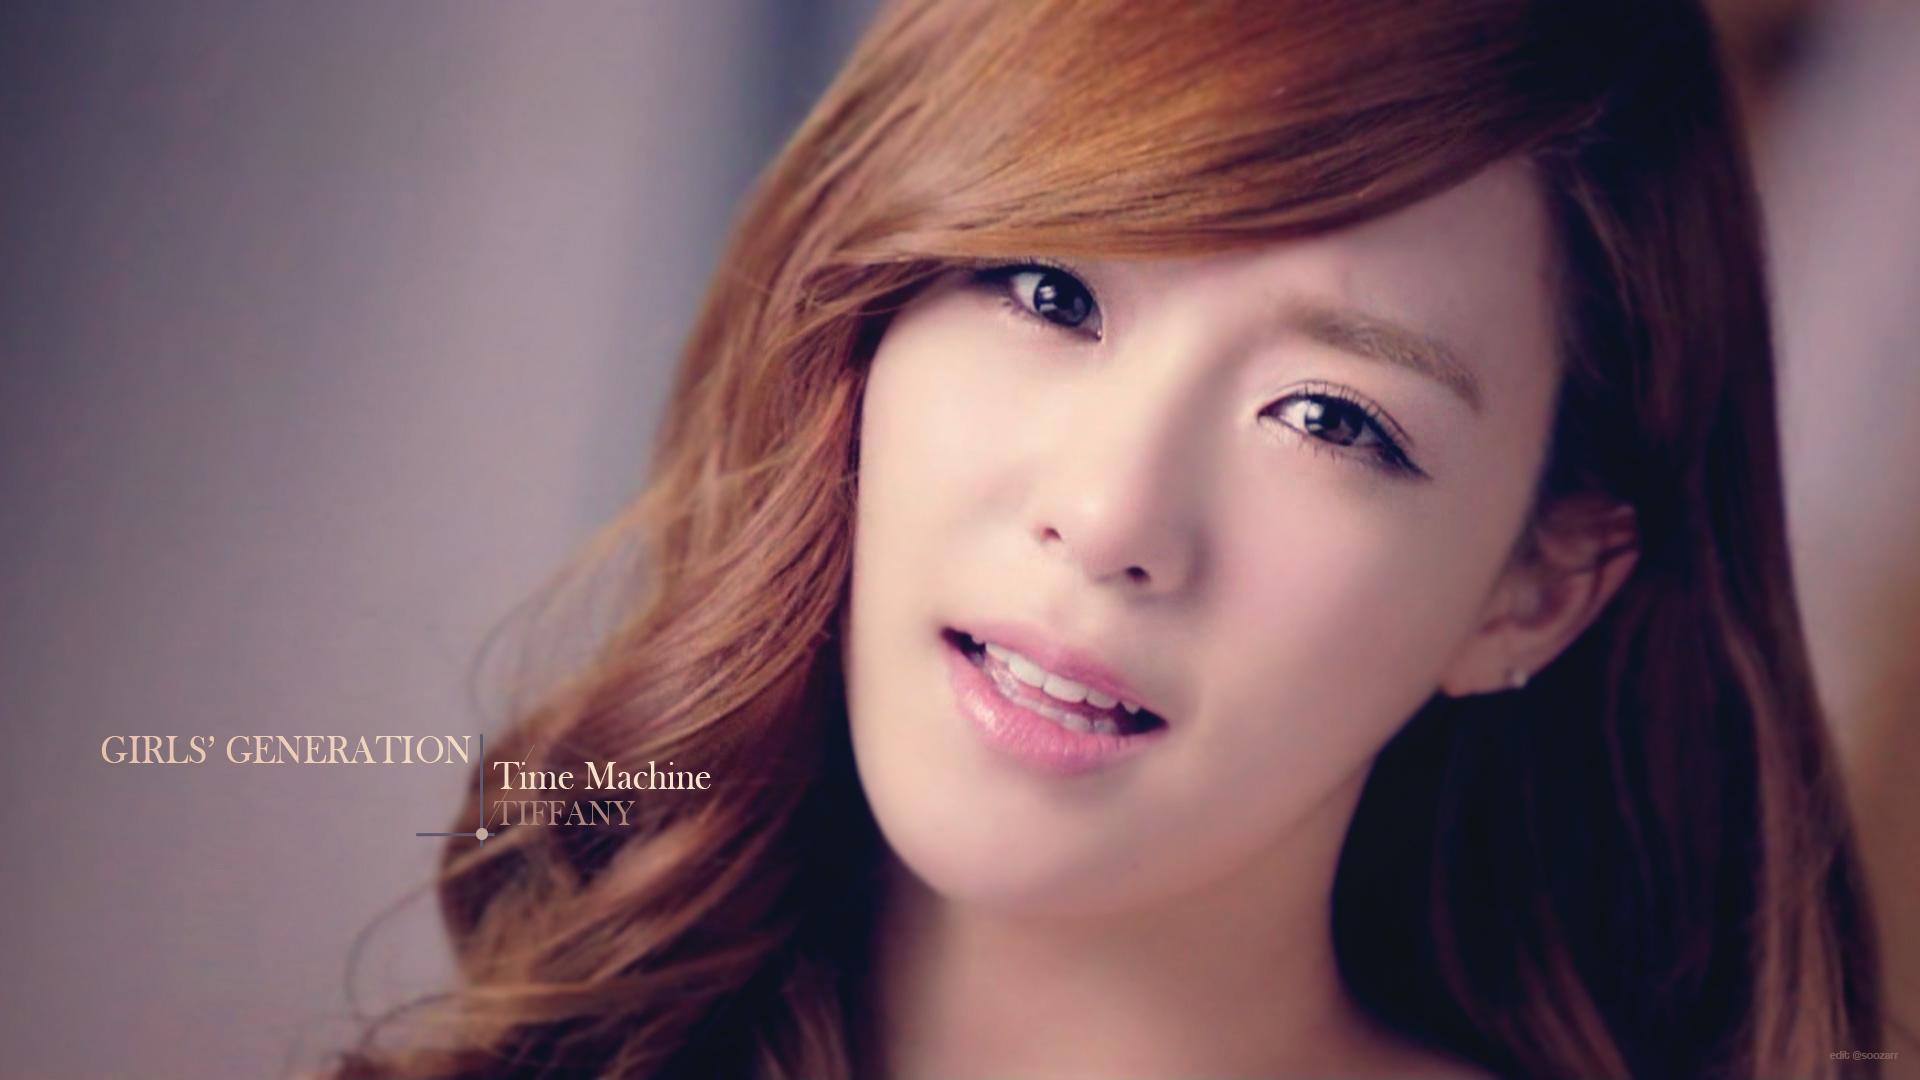 Sunny Girls Generation Wallpaper Girls Generation Snsd Images Snsd Tiffany Time Machine